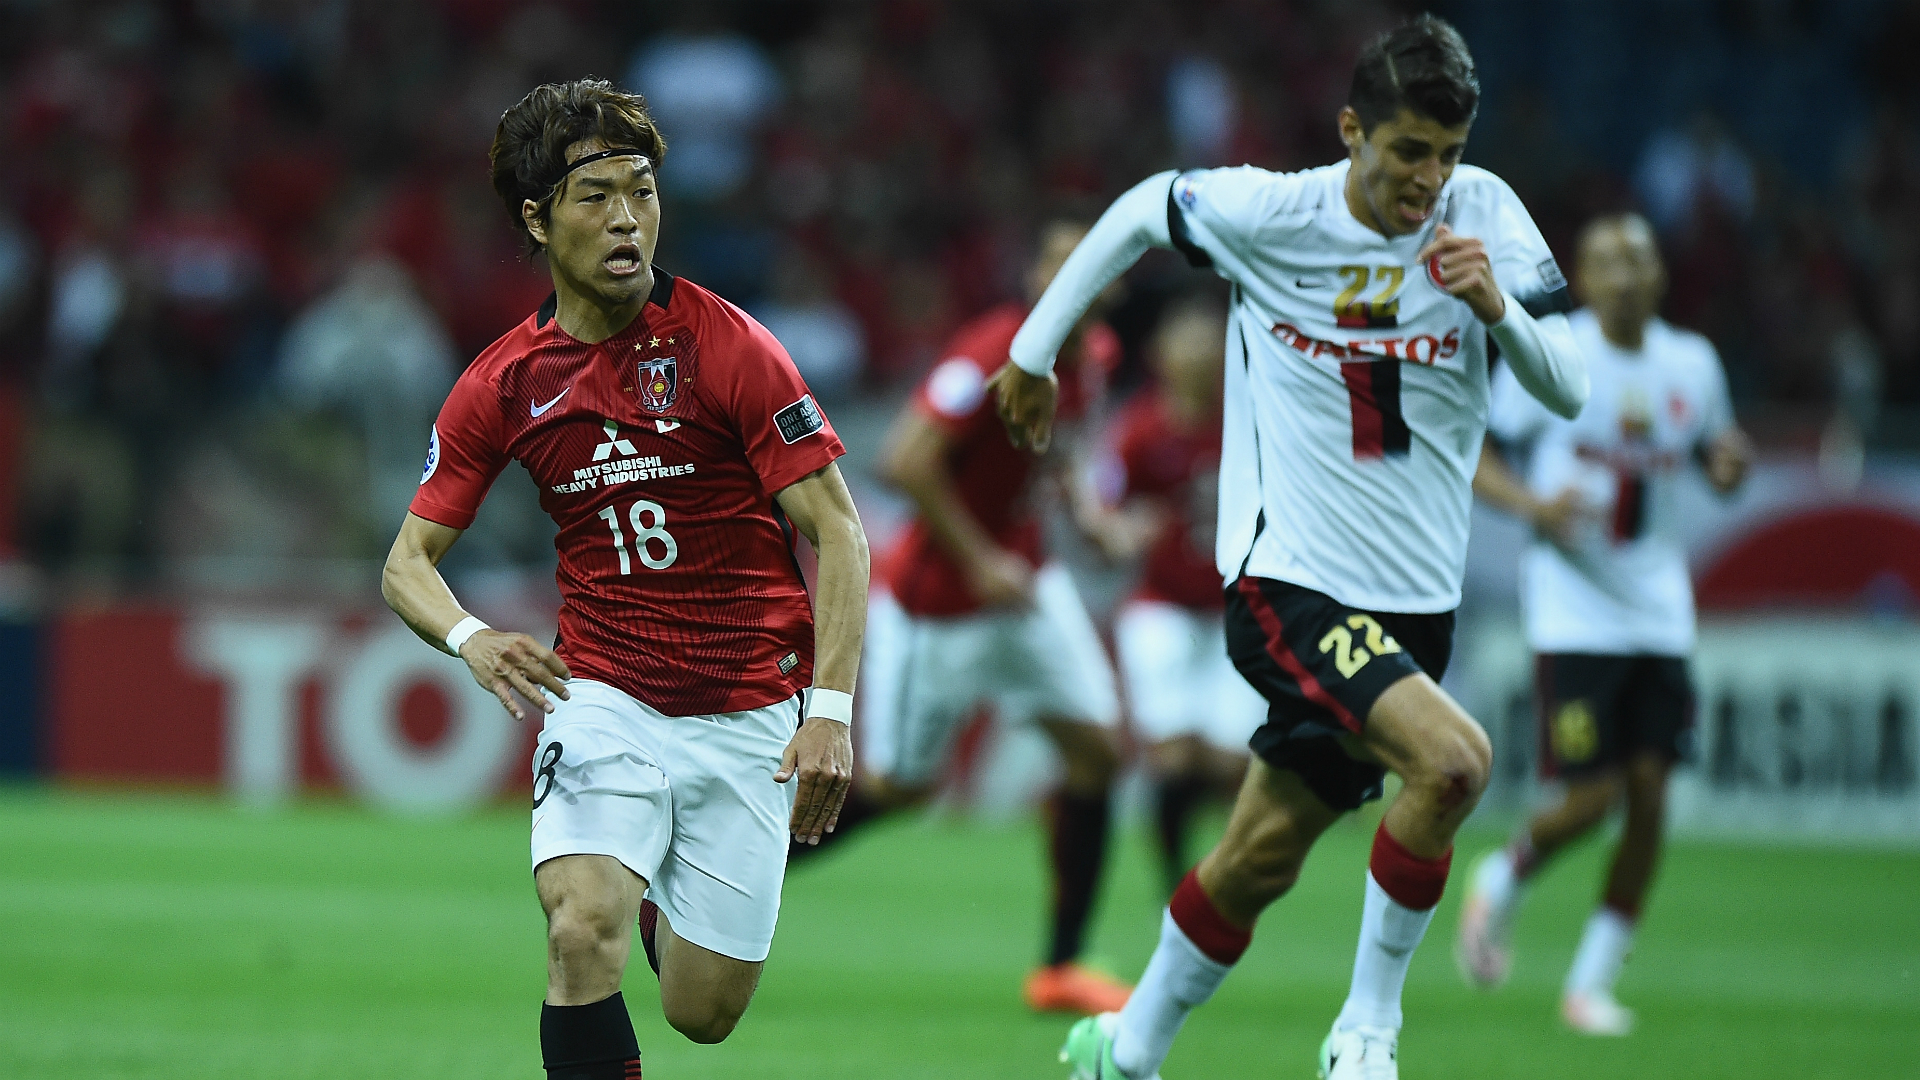 Yoshiaki Komai Jonathan Aspropotamitis Urawa Red Diamonds v Western Sydney Wanderers AFC Champions League 26042017